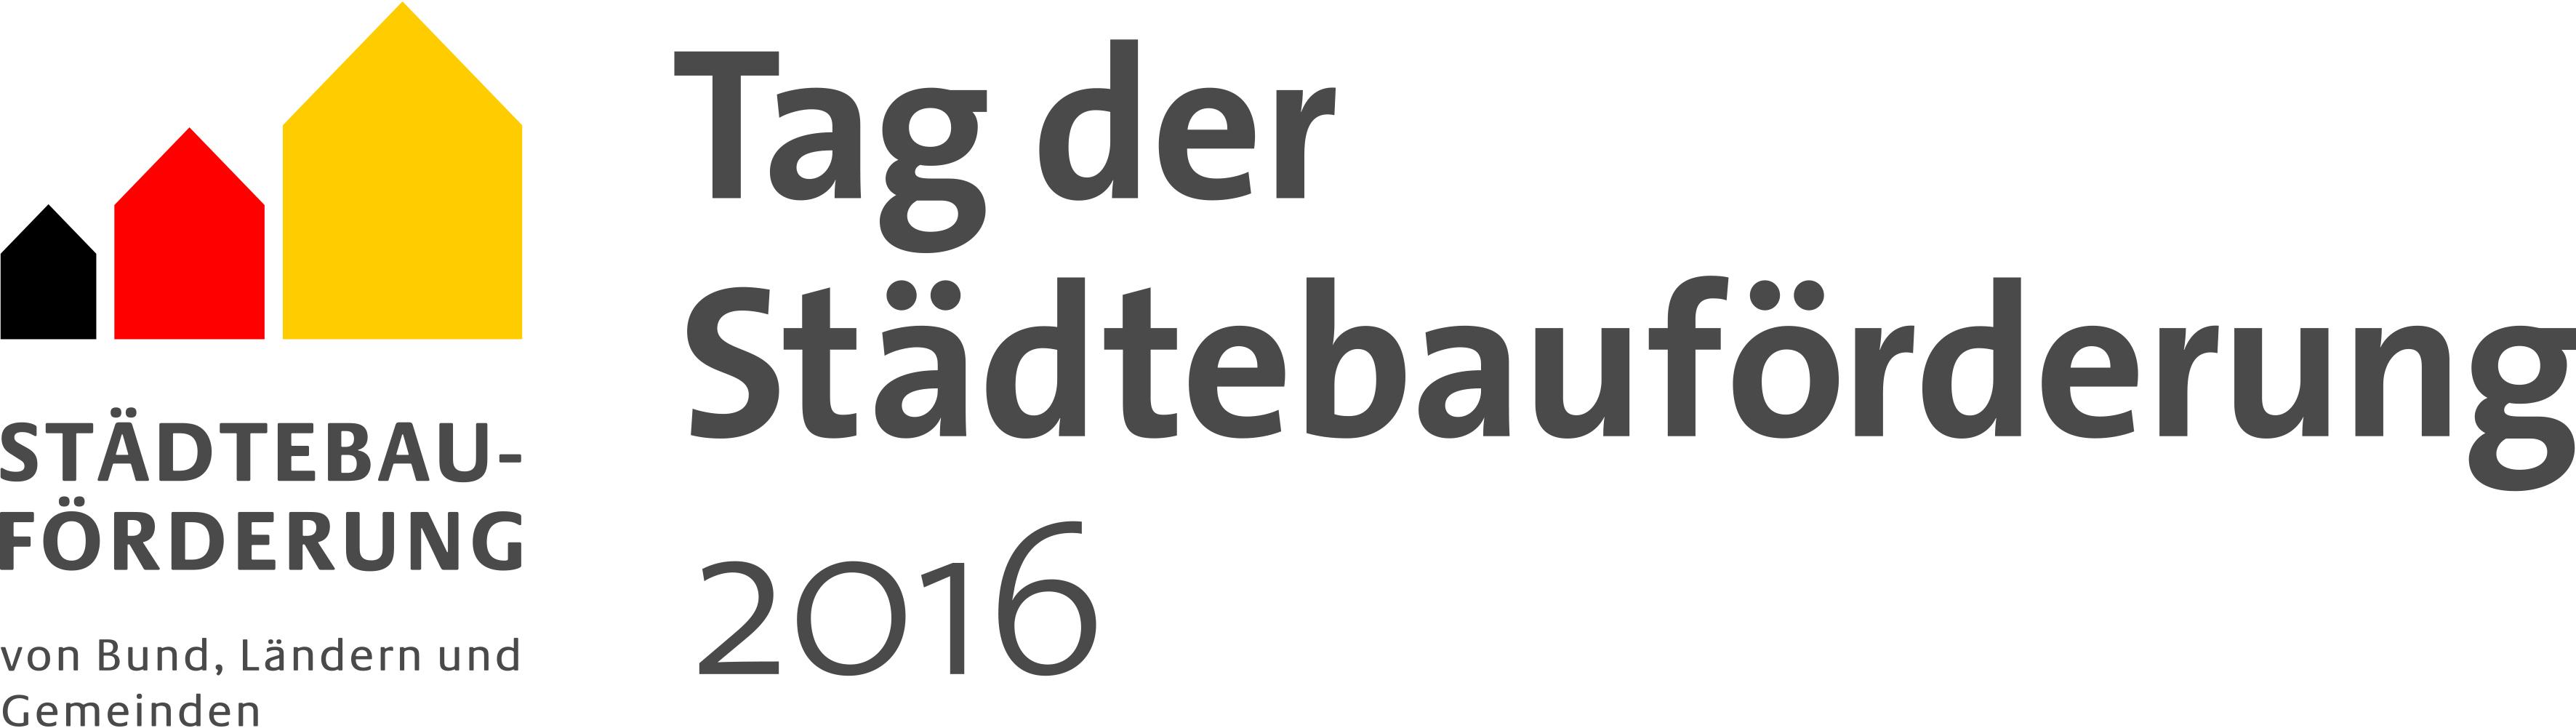 TagDerStaedtebaufoerderung2016_Logo_RGB_farbig